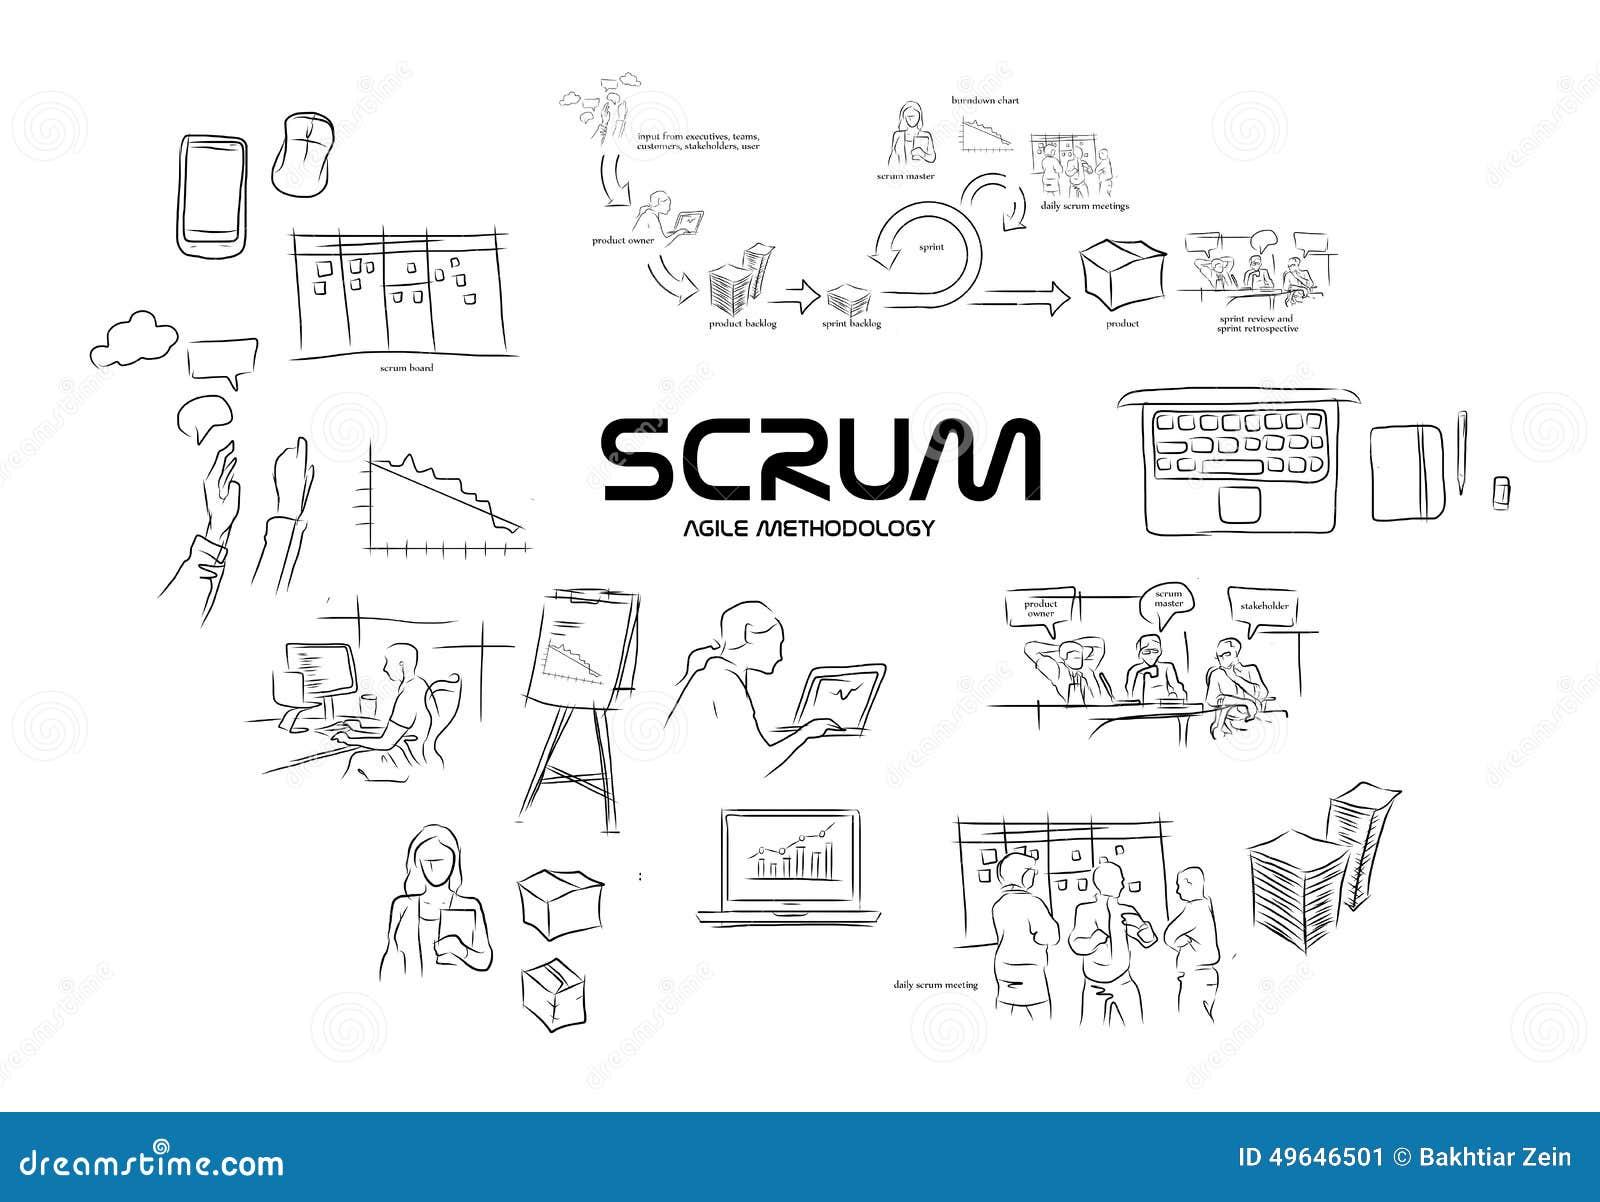 software development life cycle methodologies